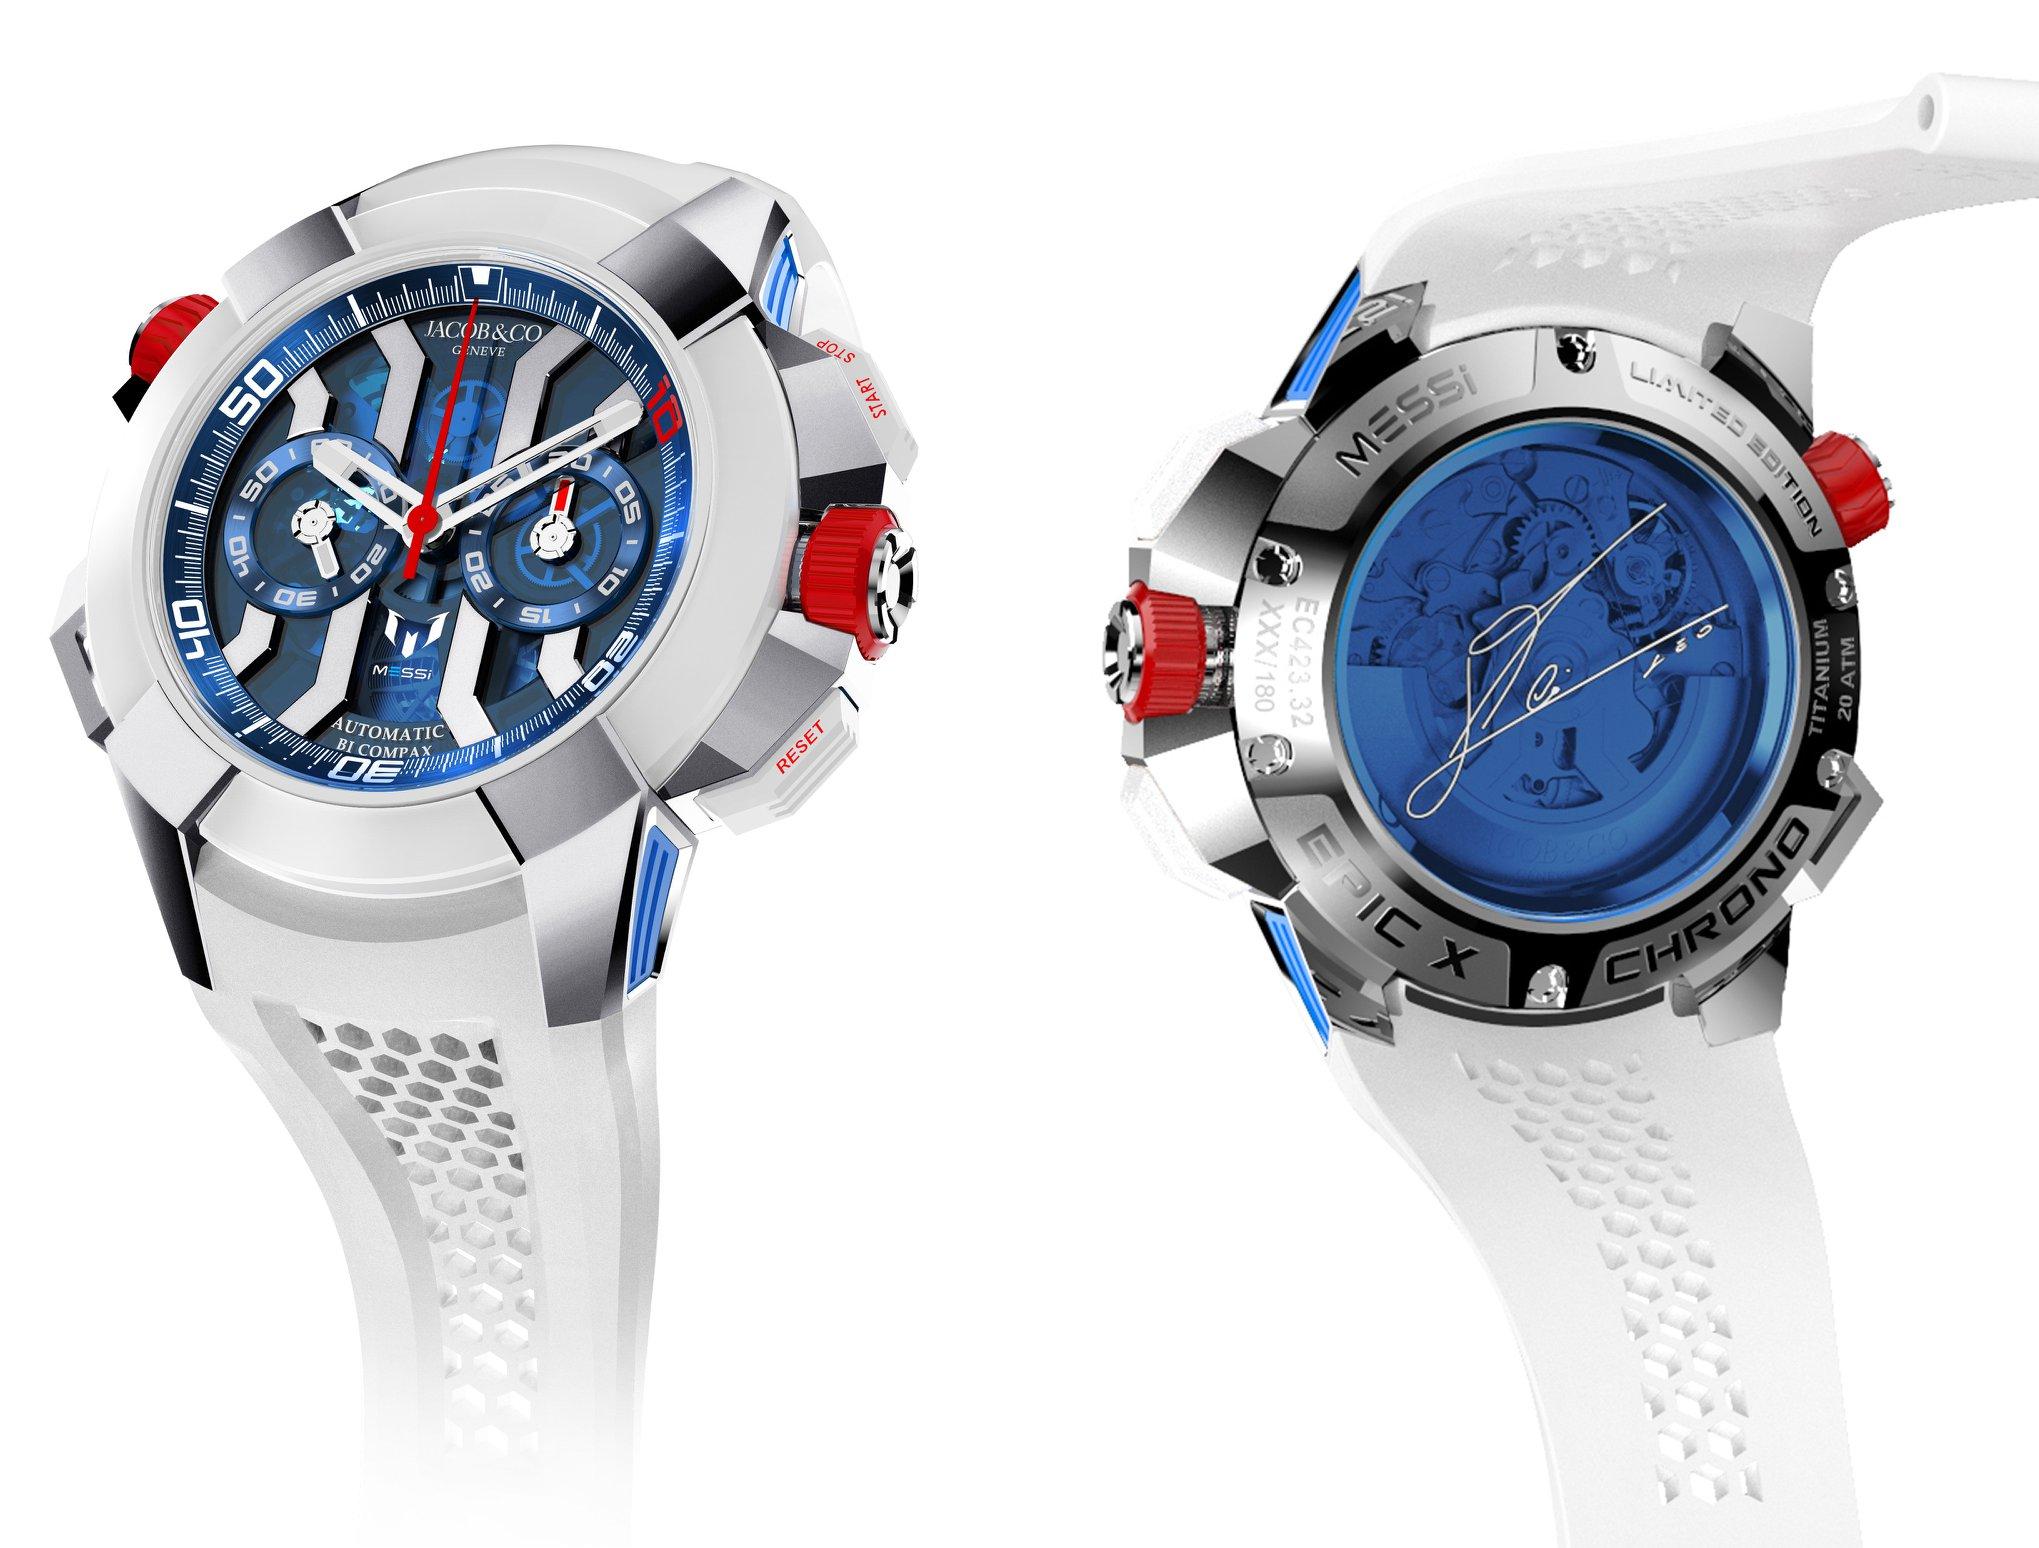 Cuánto vale el reloj de Lionel Messi * Watches World : Watches World